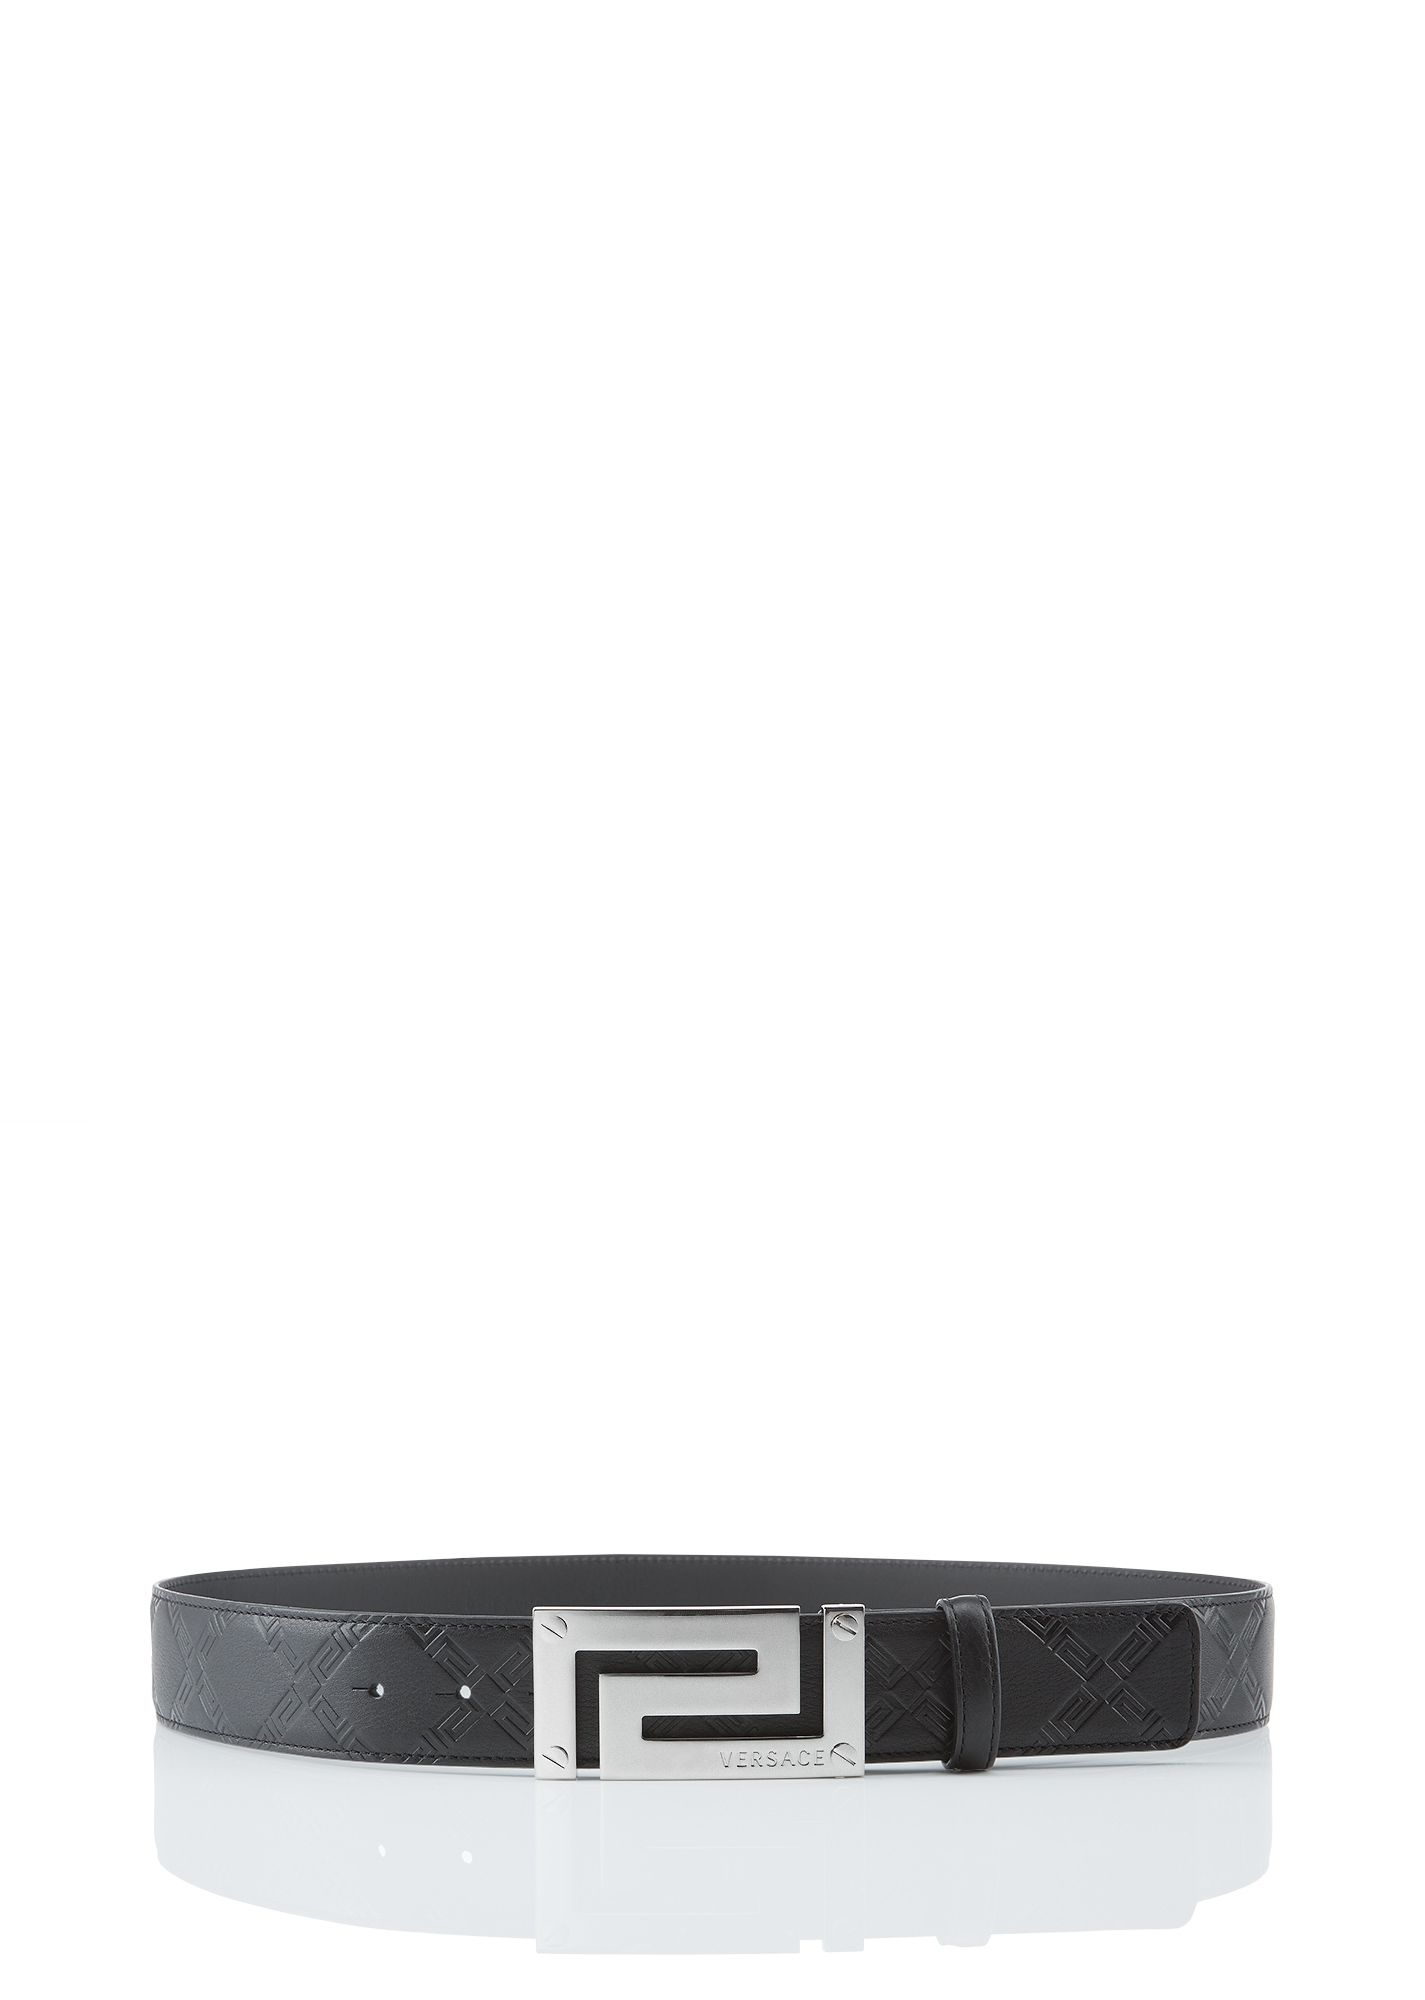 Greca Leather Belt  Versace  VersaceMenswear   Belts   Pinterest ... a7b2f629d73